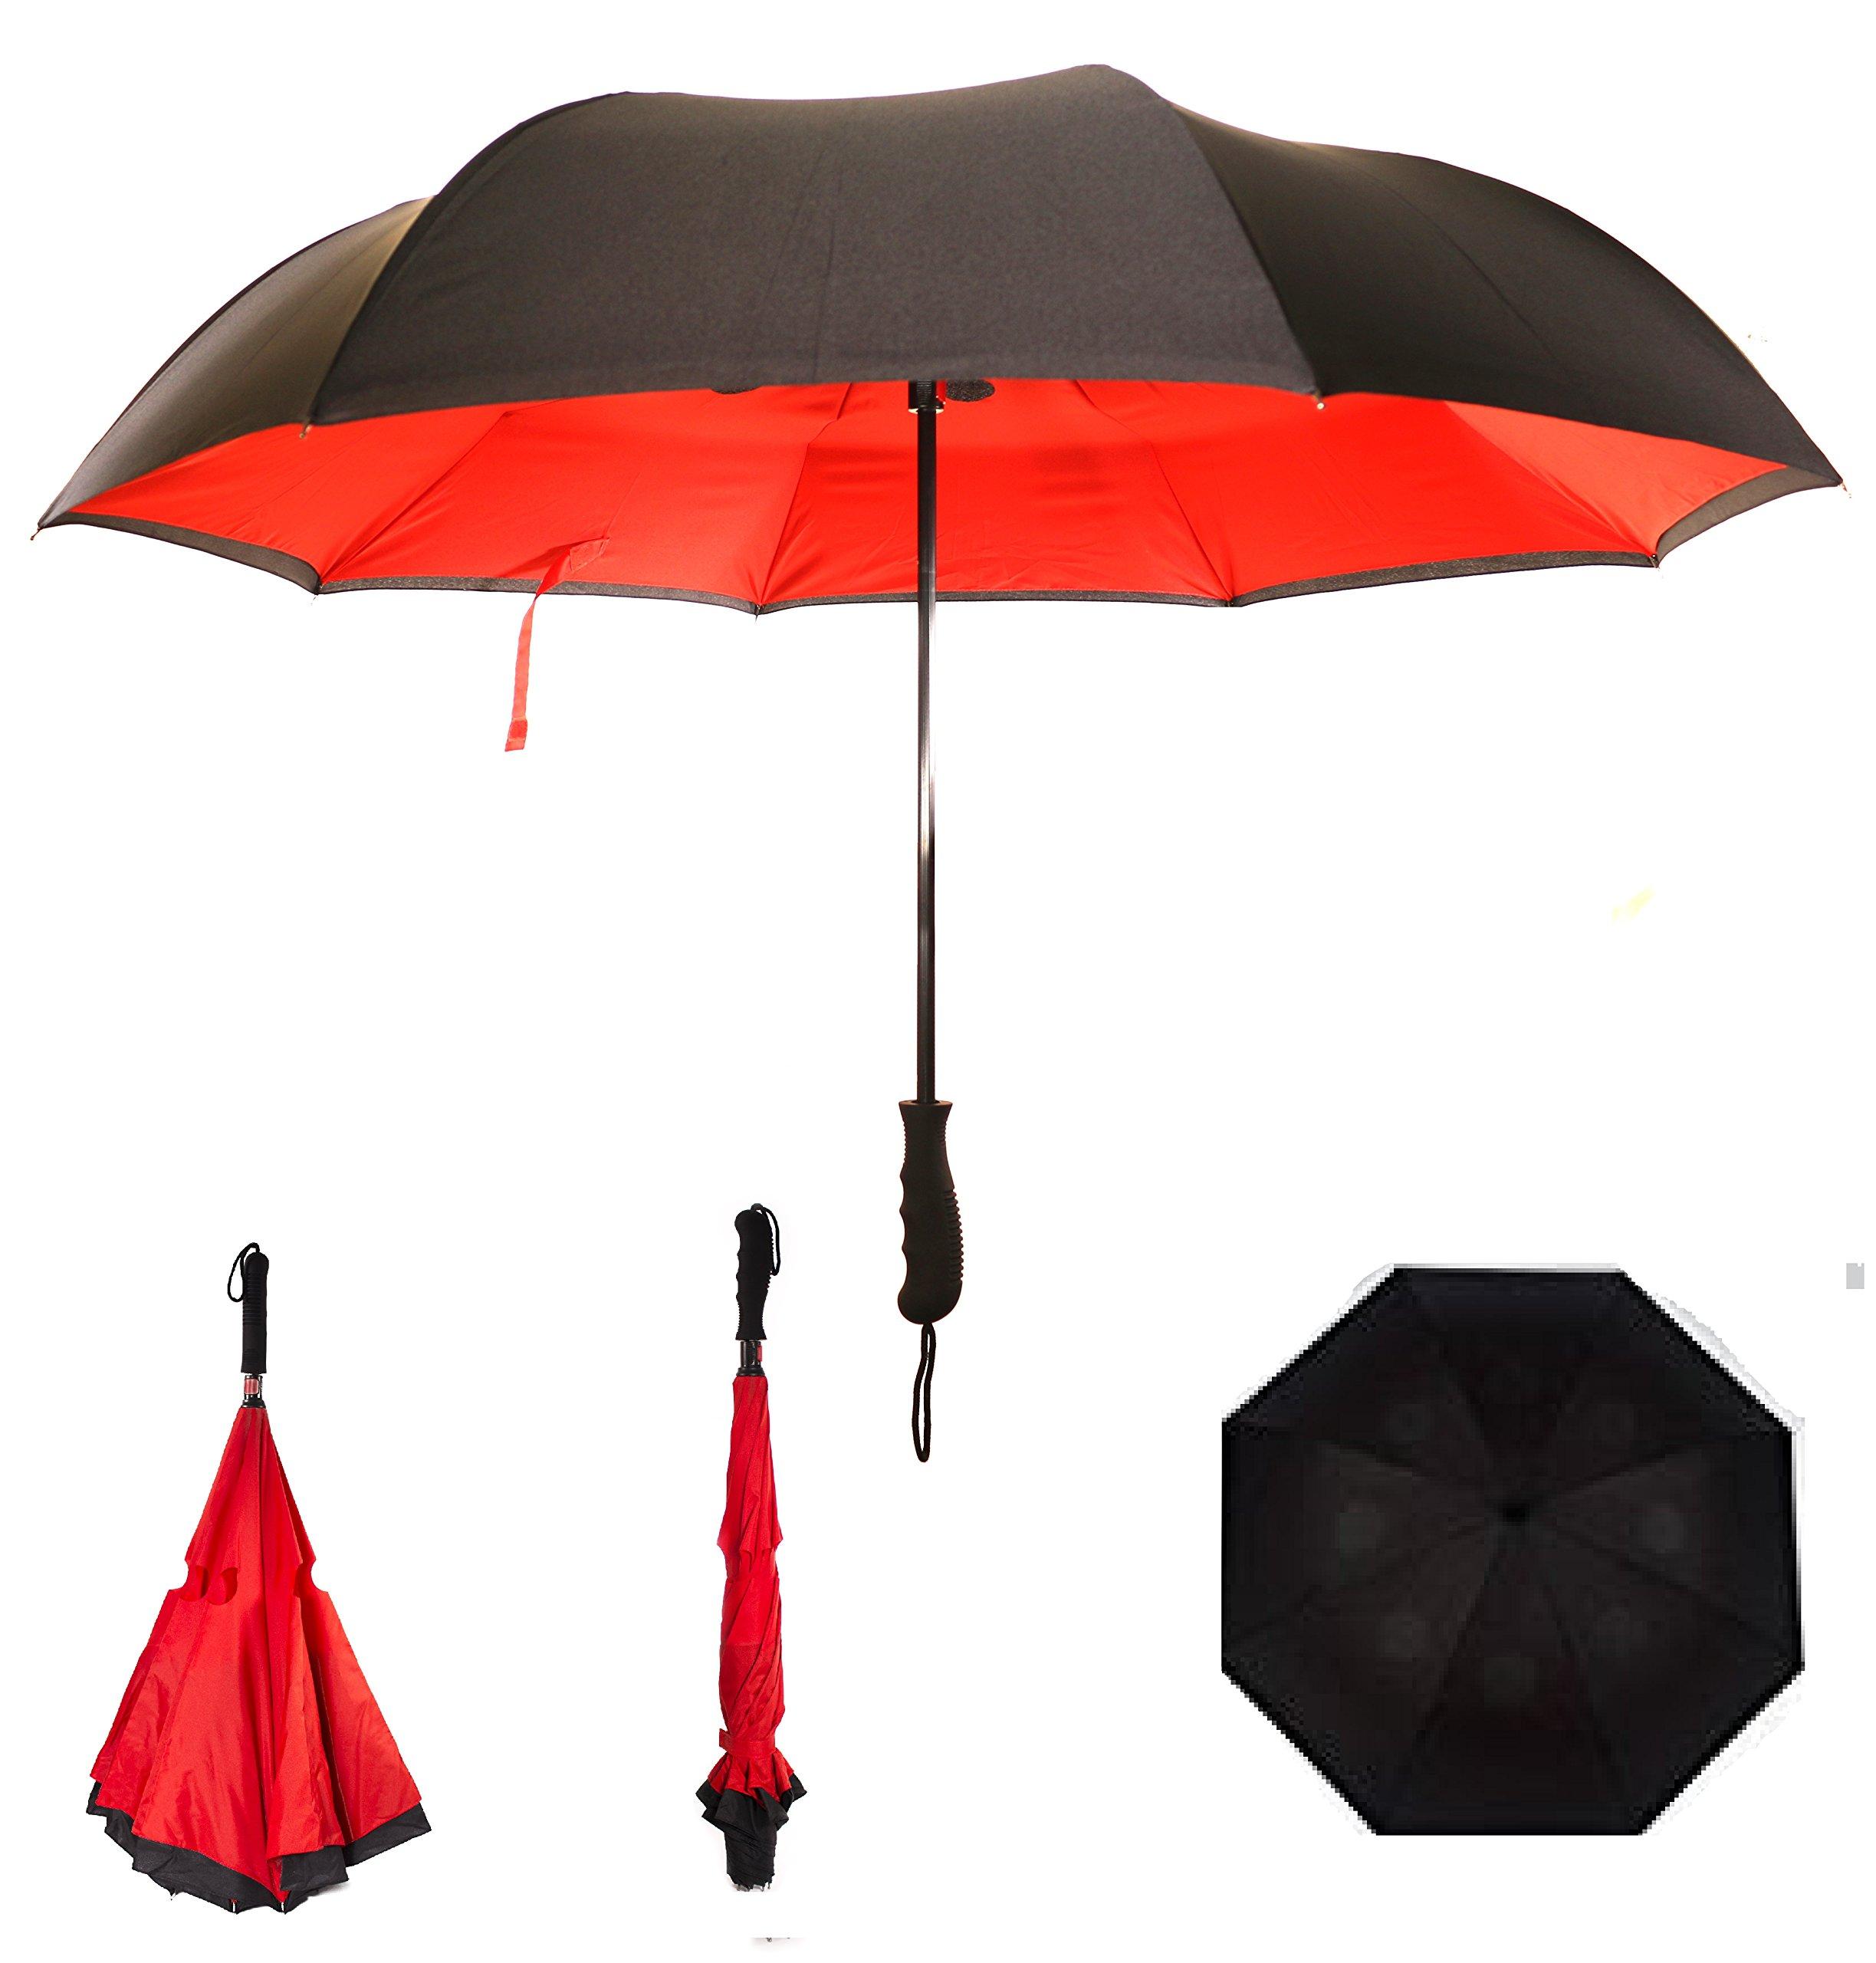 be3a58c6bf Paraguas Invertido. Paraguas Inverso Original Reversible de Colores ...